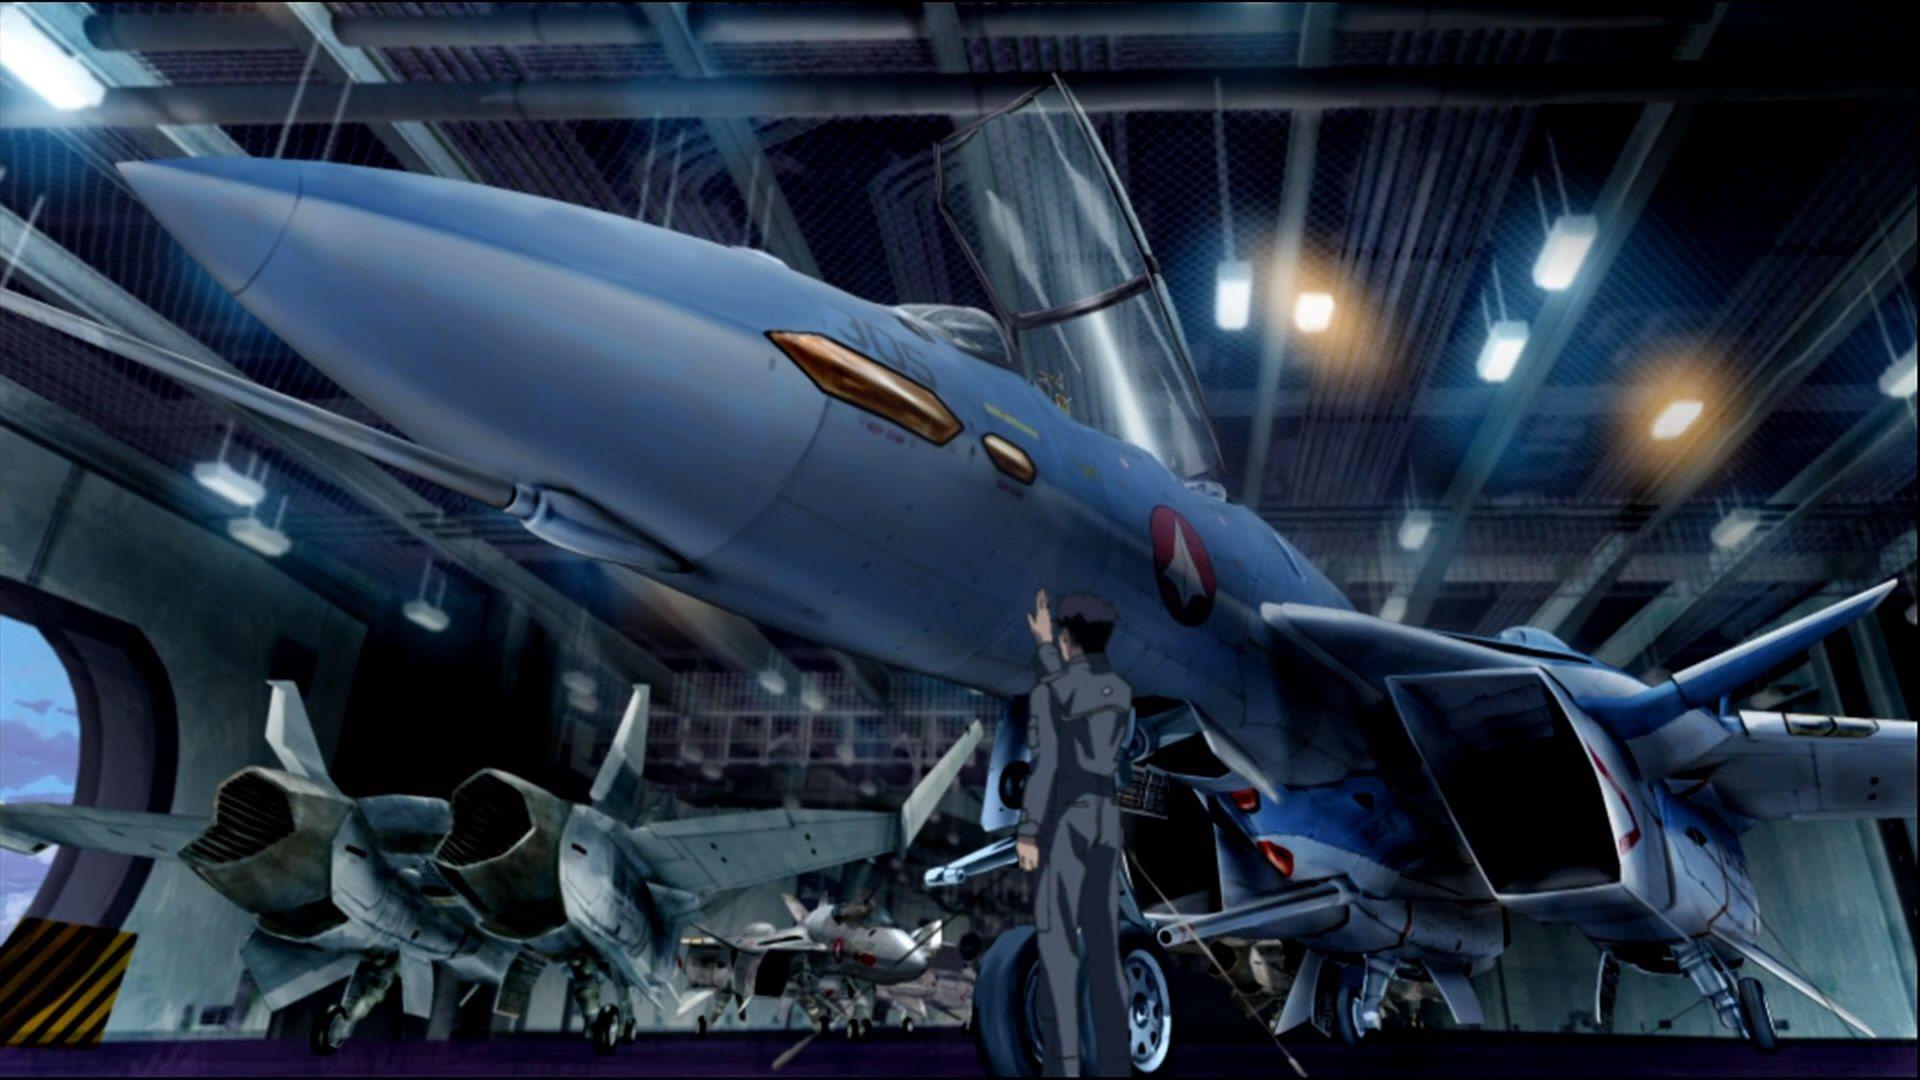 Cap Flightsuit Hangar Kudou Shin Macross Zero Mecha U